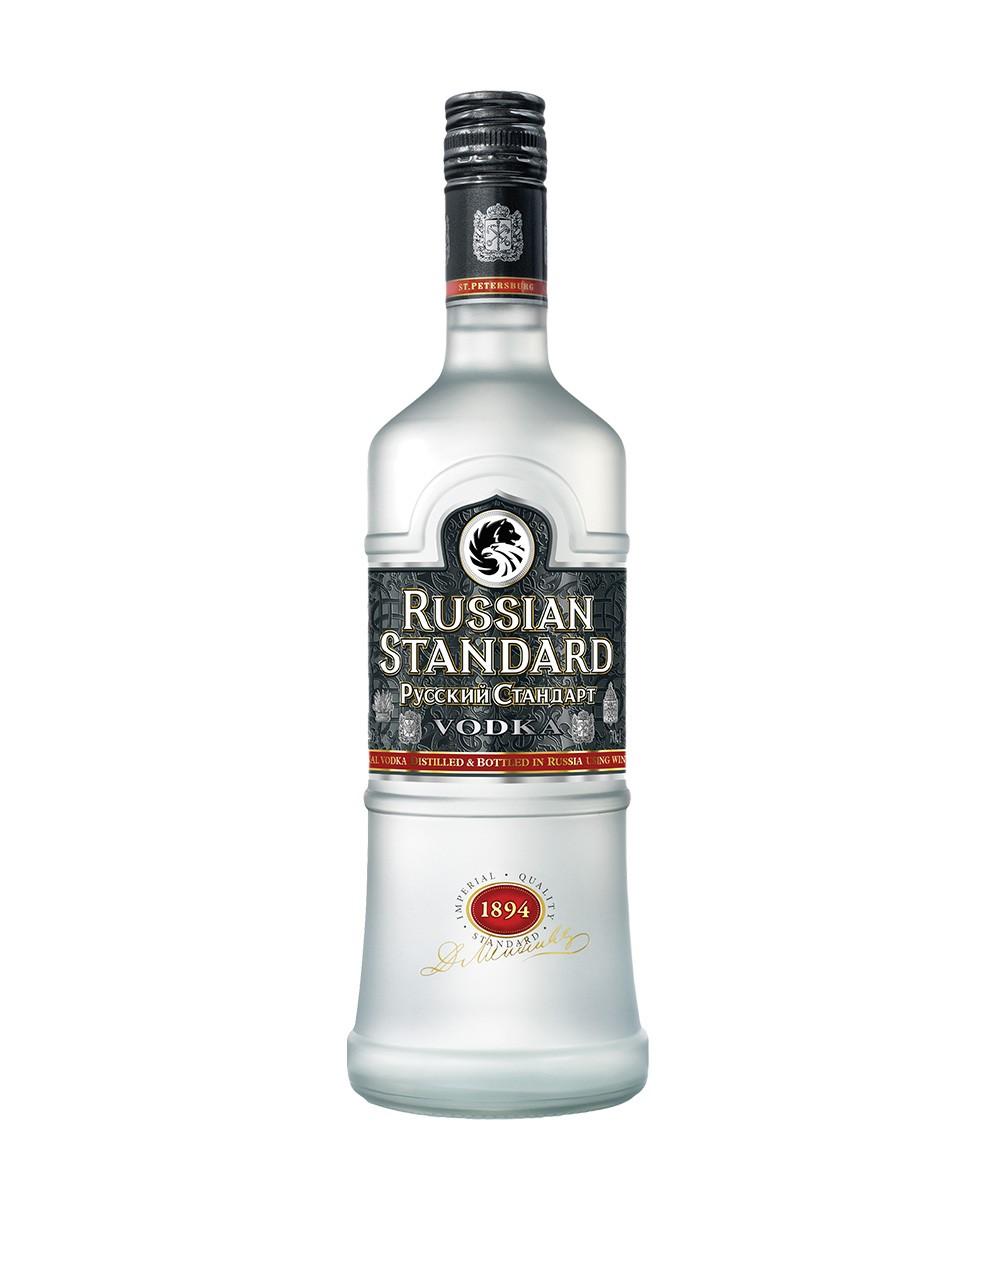 Russian Standard Original | Buy Online or Send as a Gift ...